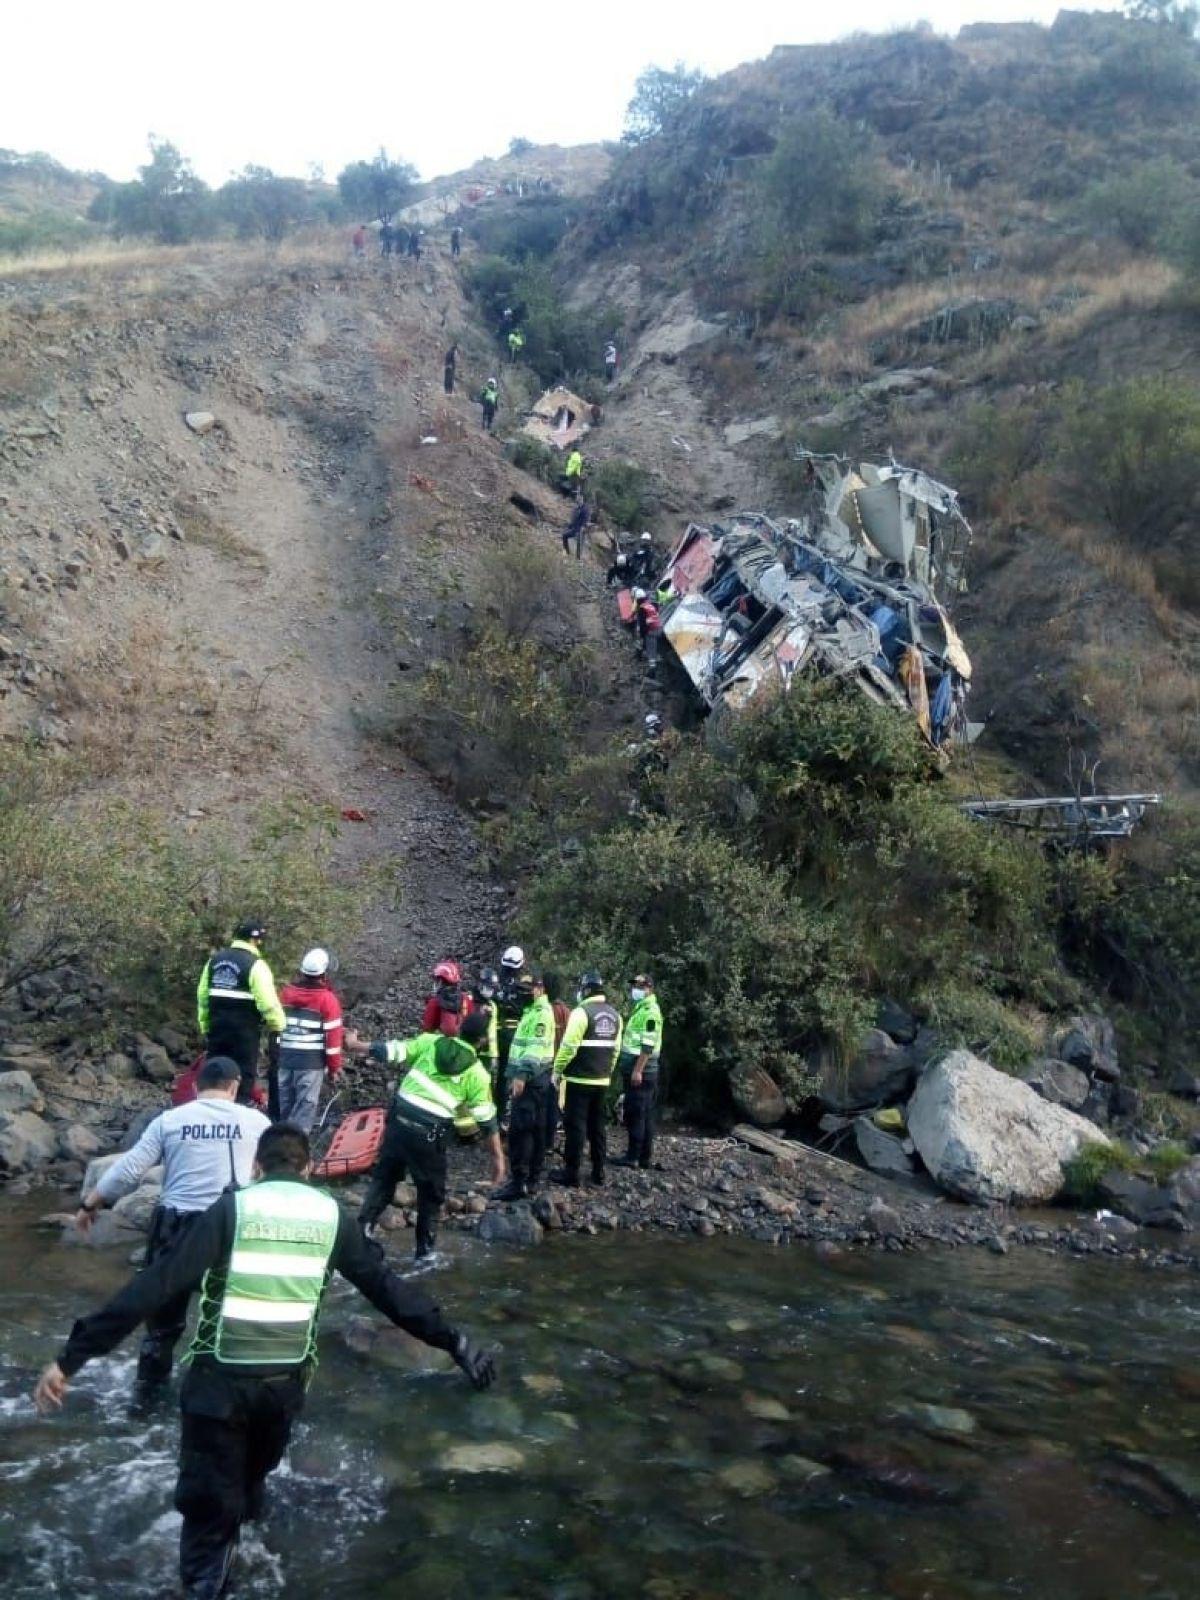 Peru'da otobüs uçuruma yuvarlandı: 29 ölü #3